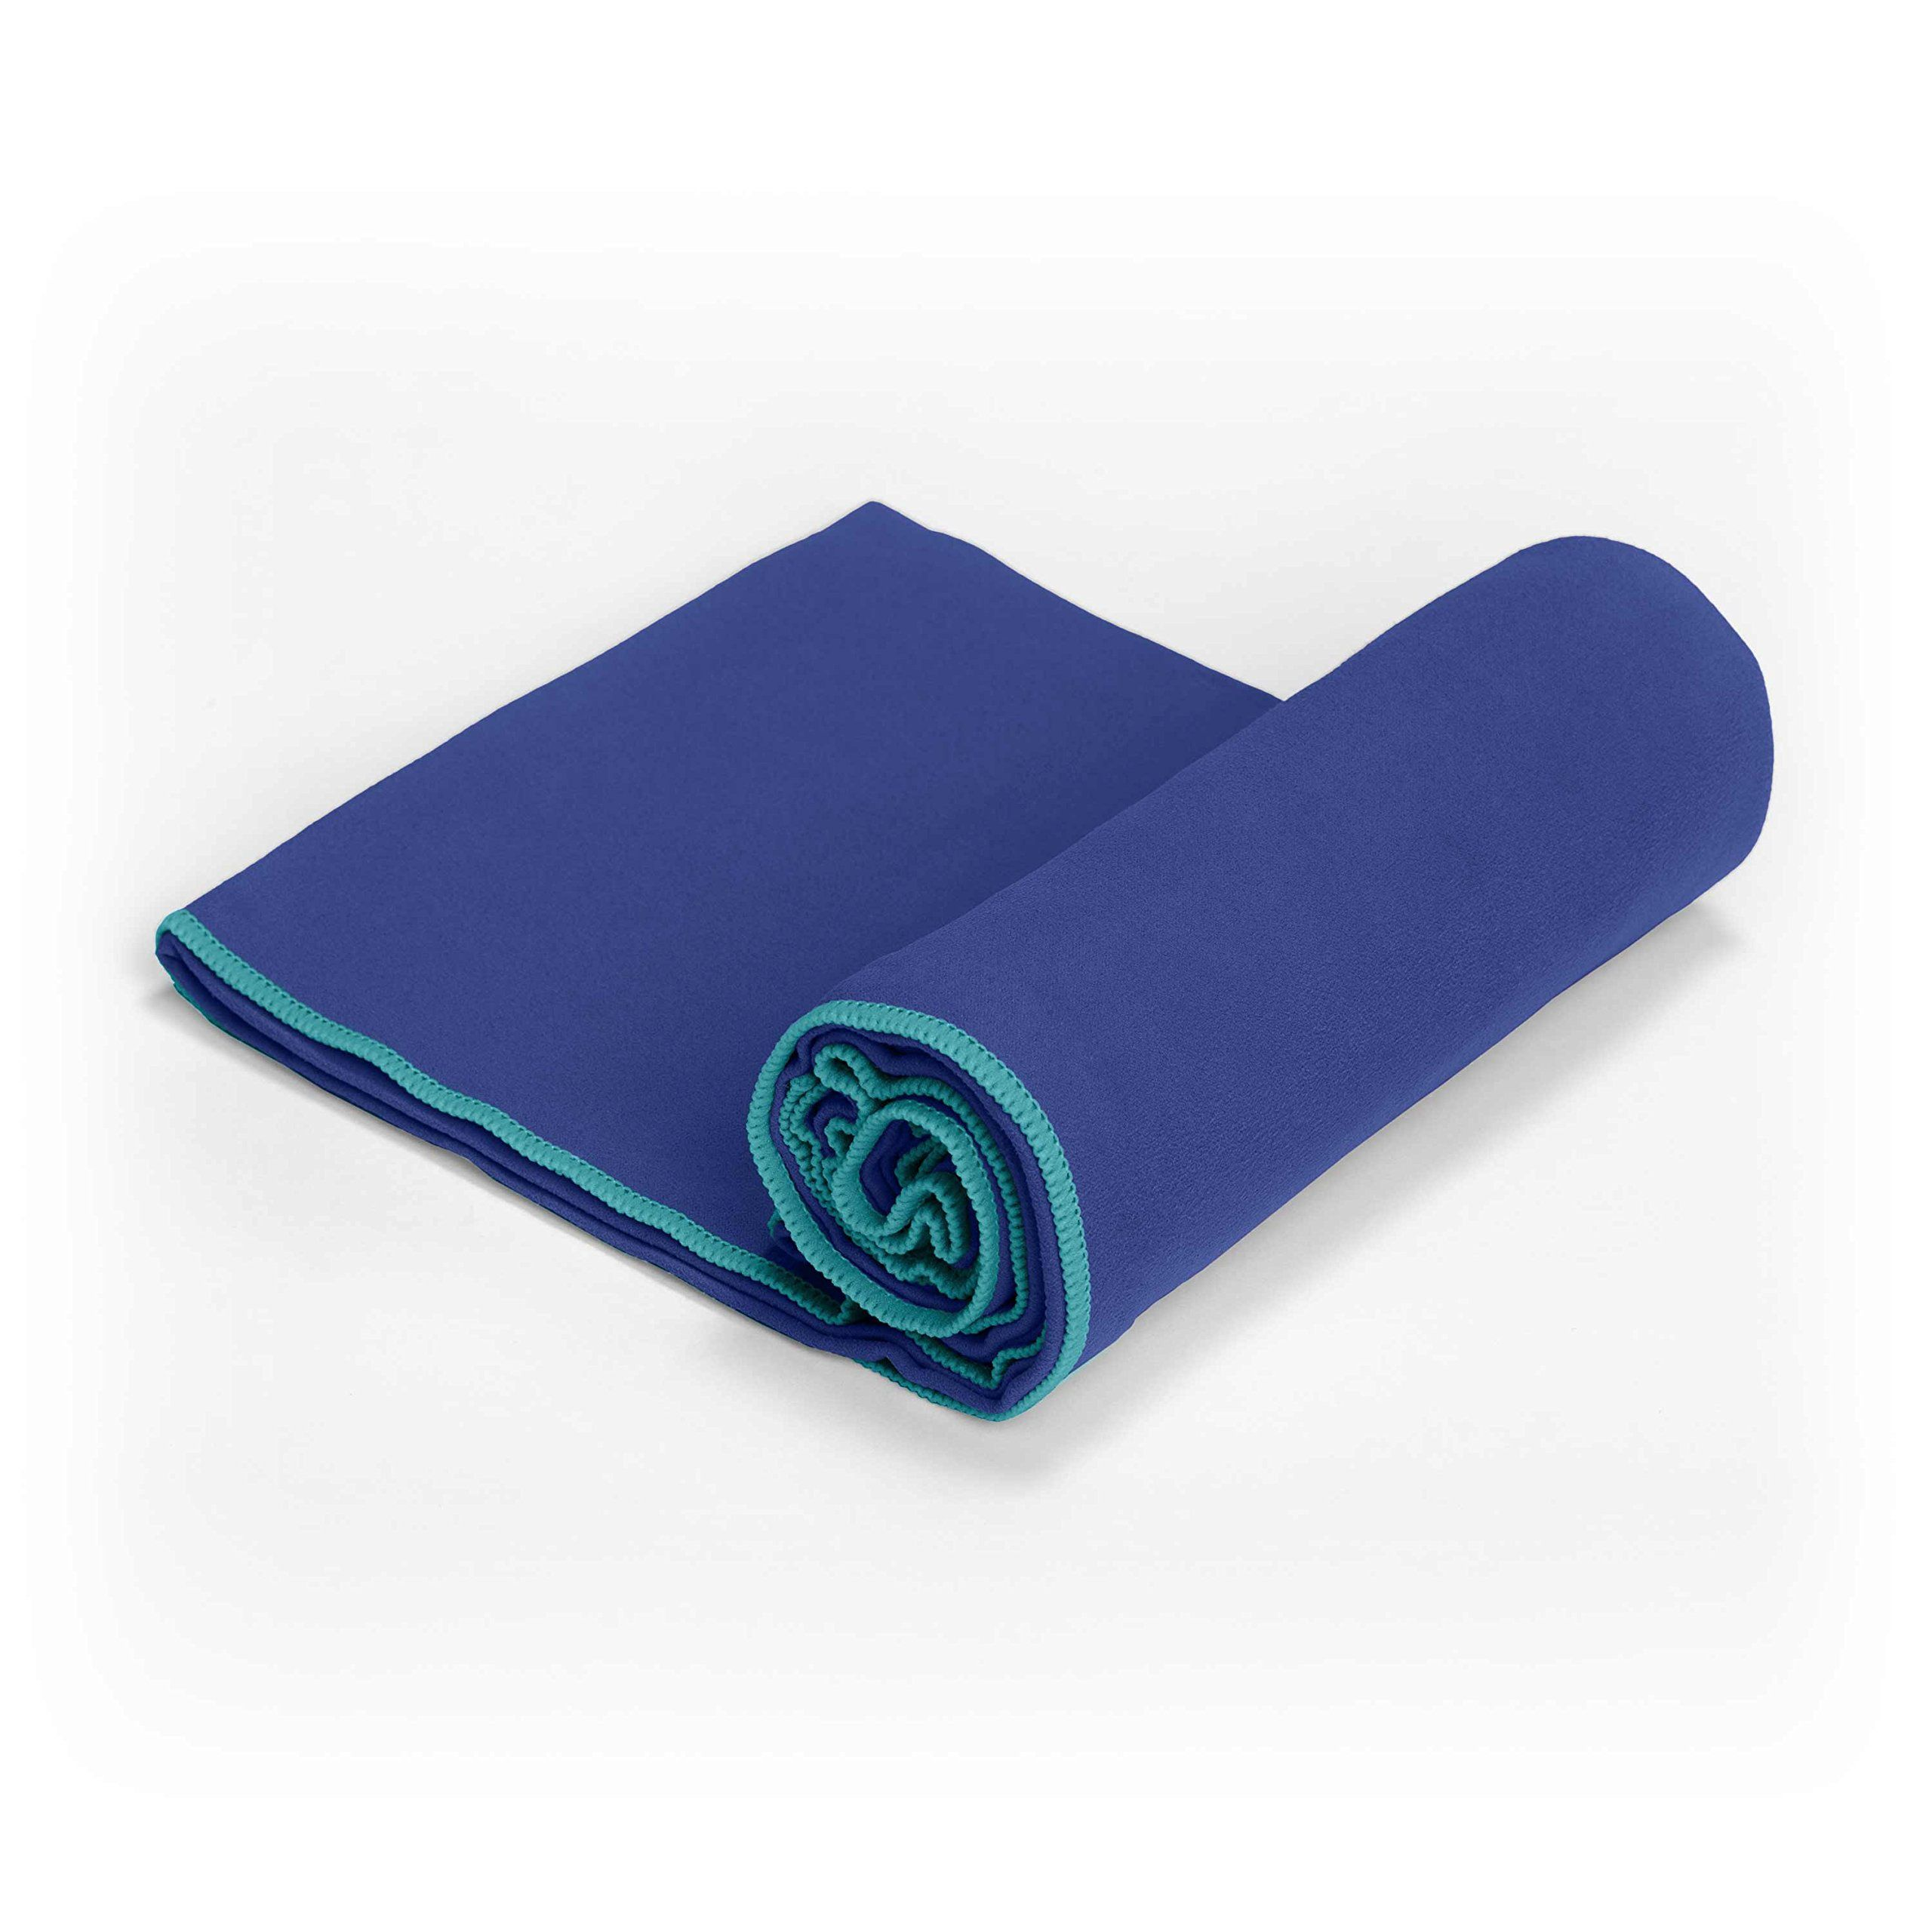 Amazon Com The Sport Travel Towel Microfiber Ultra Light Hang Loop 3 Sizes Beach Gym Hand Many Colors Super Abso Sport Towel Microfiber Travel Towel